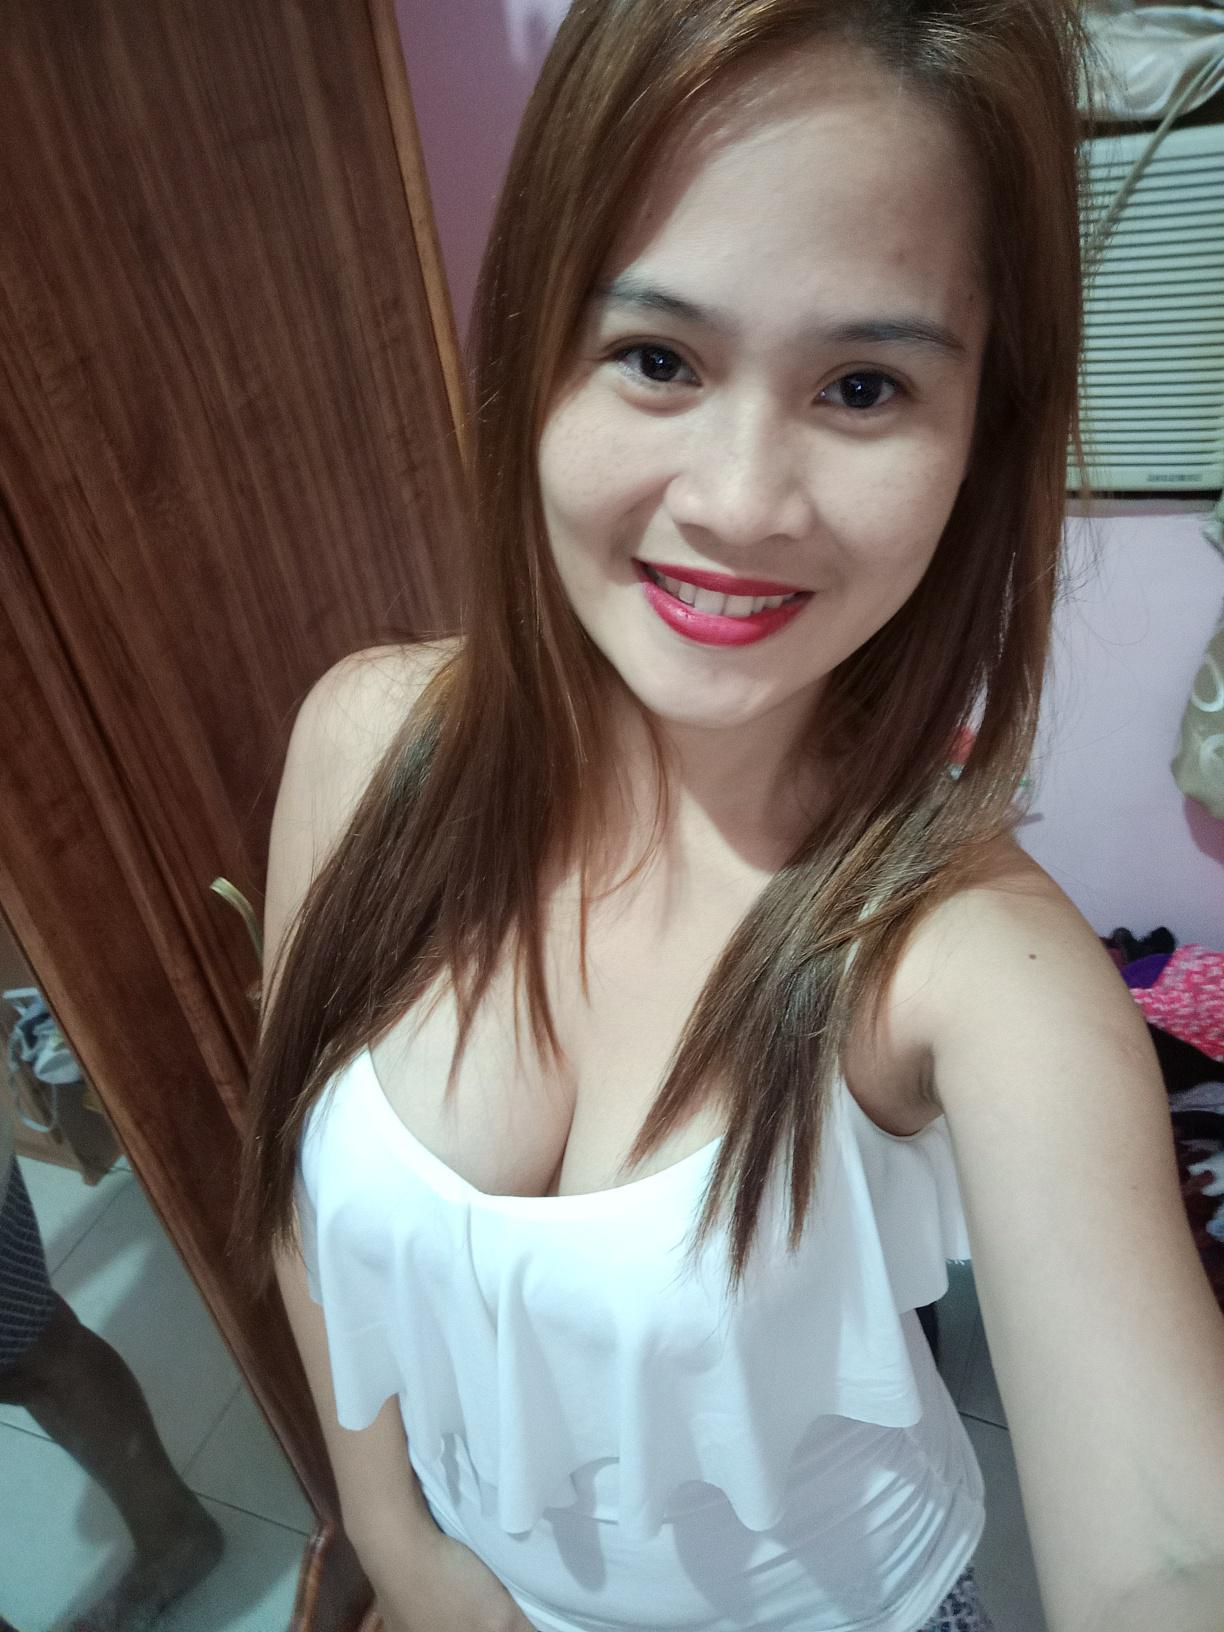 Cagayan de Oro serwisy randkowe randki sims gry komputerowe